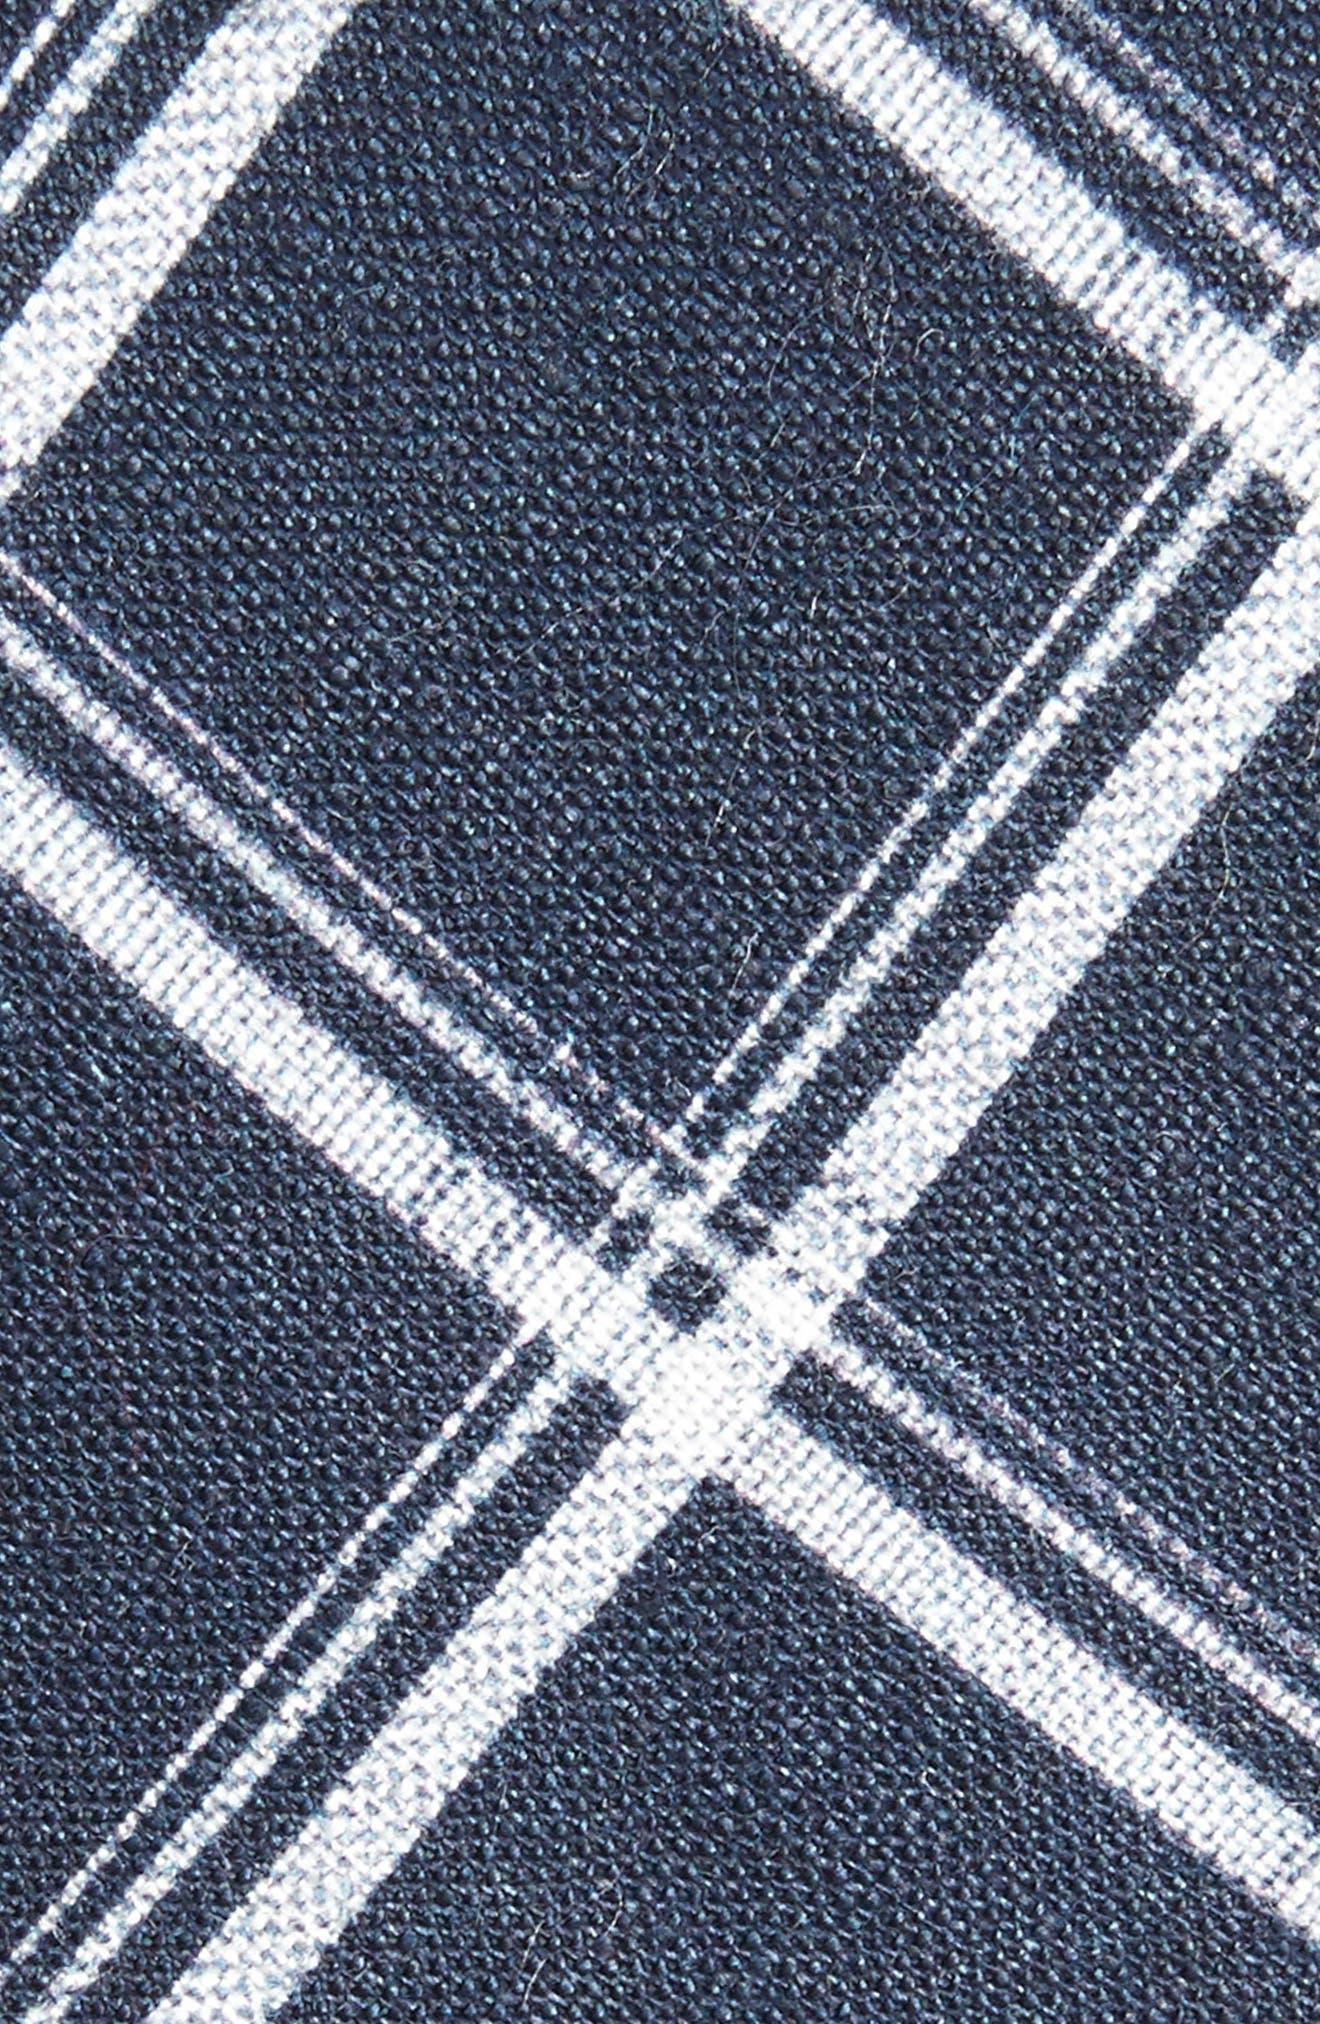 Jet Plaid Linen Skinny Tie,                             Alternate thumbnail 4, color,